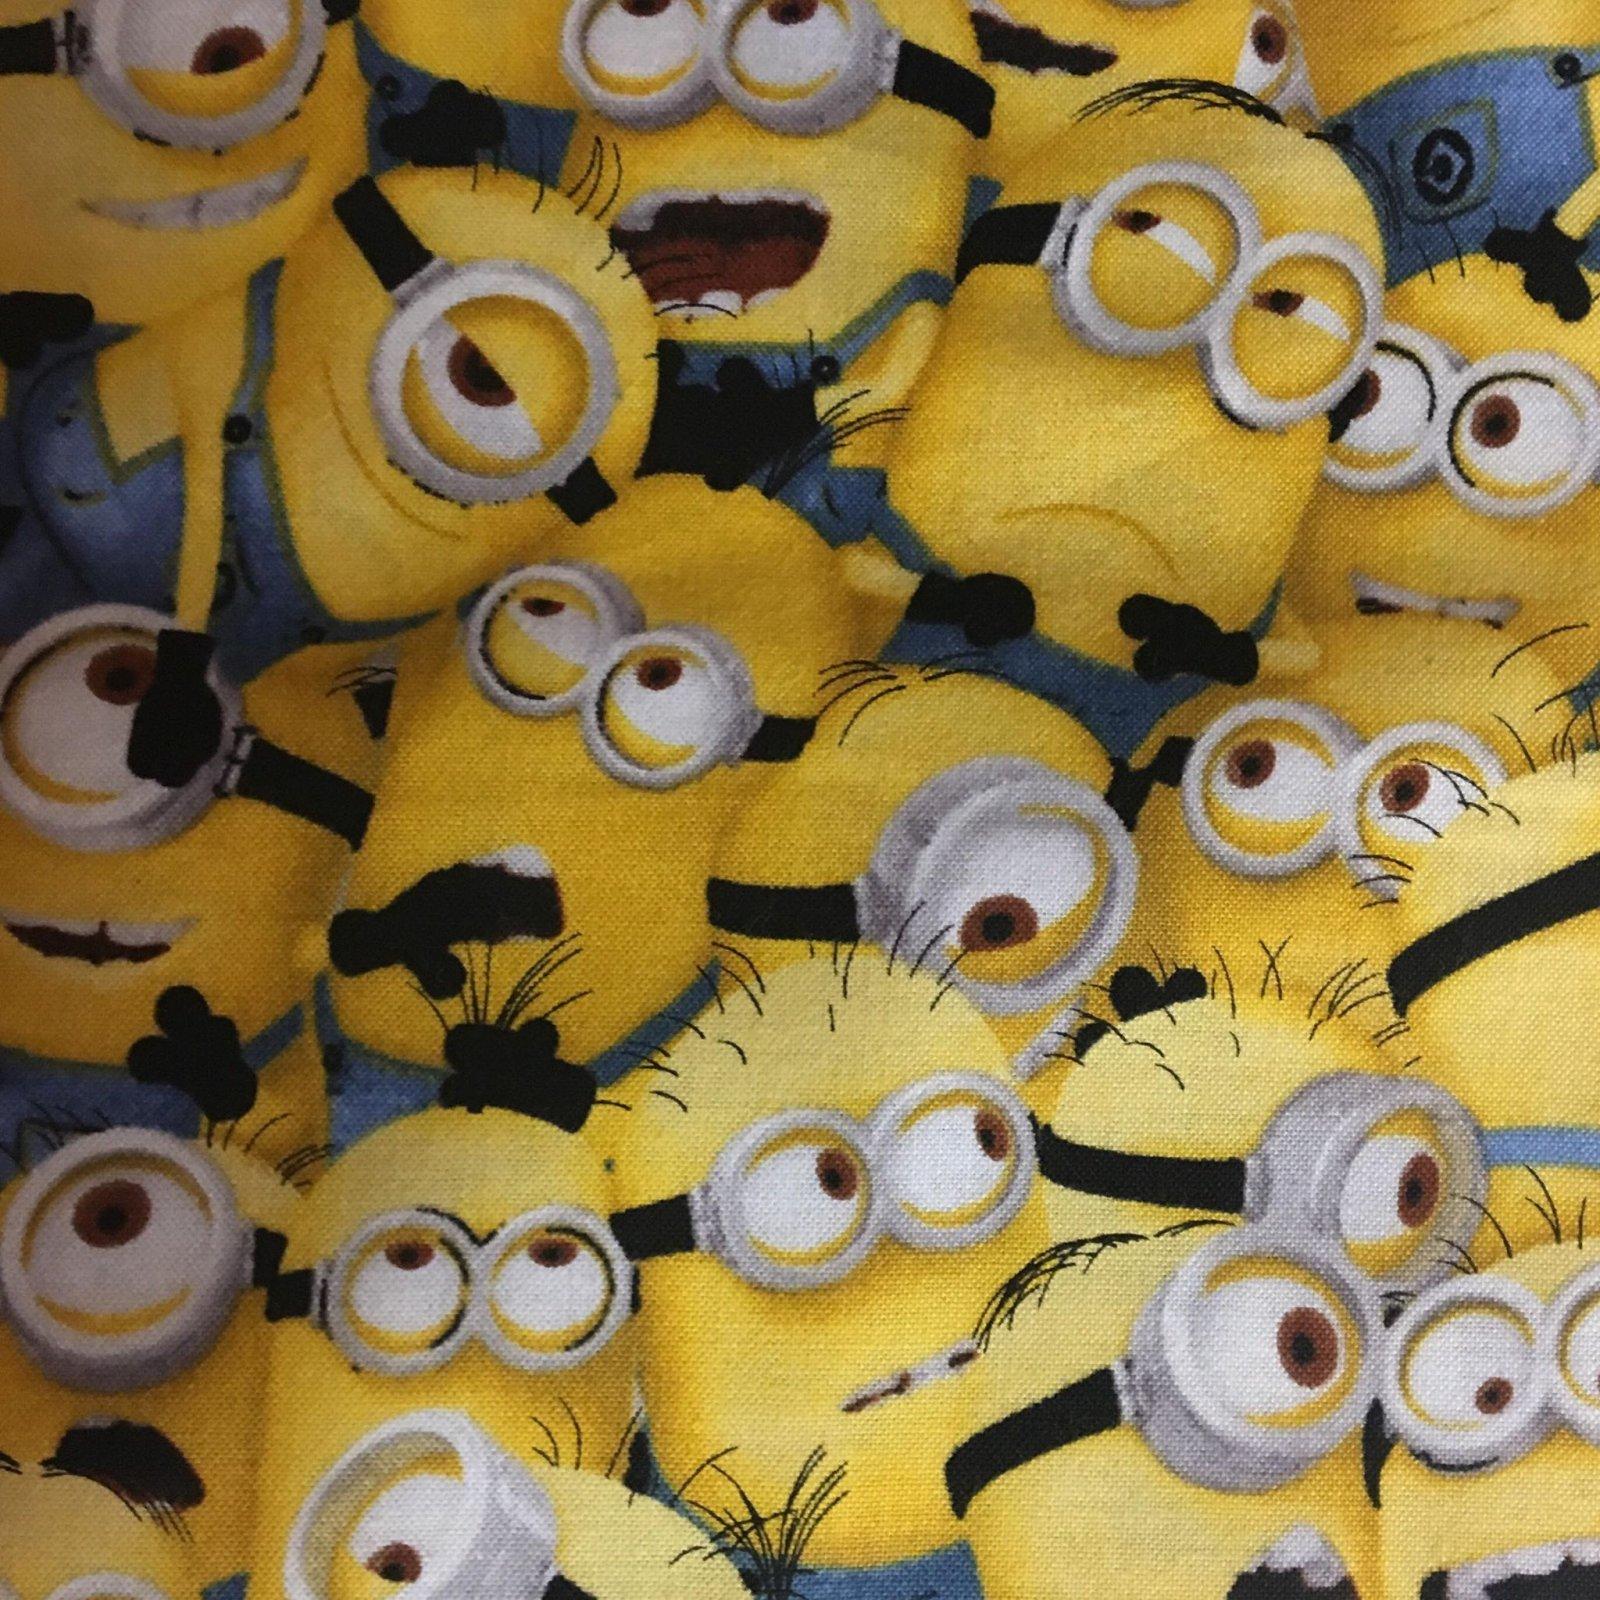 Crowded Minions